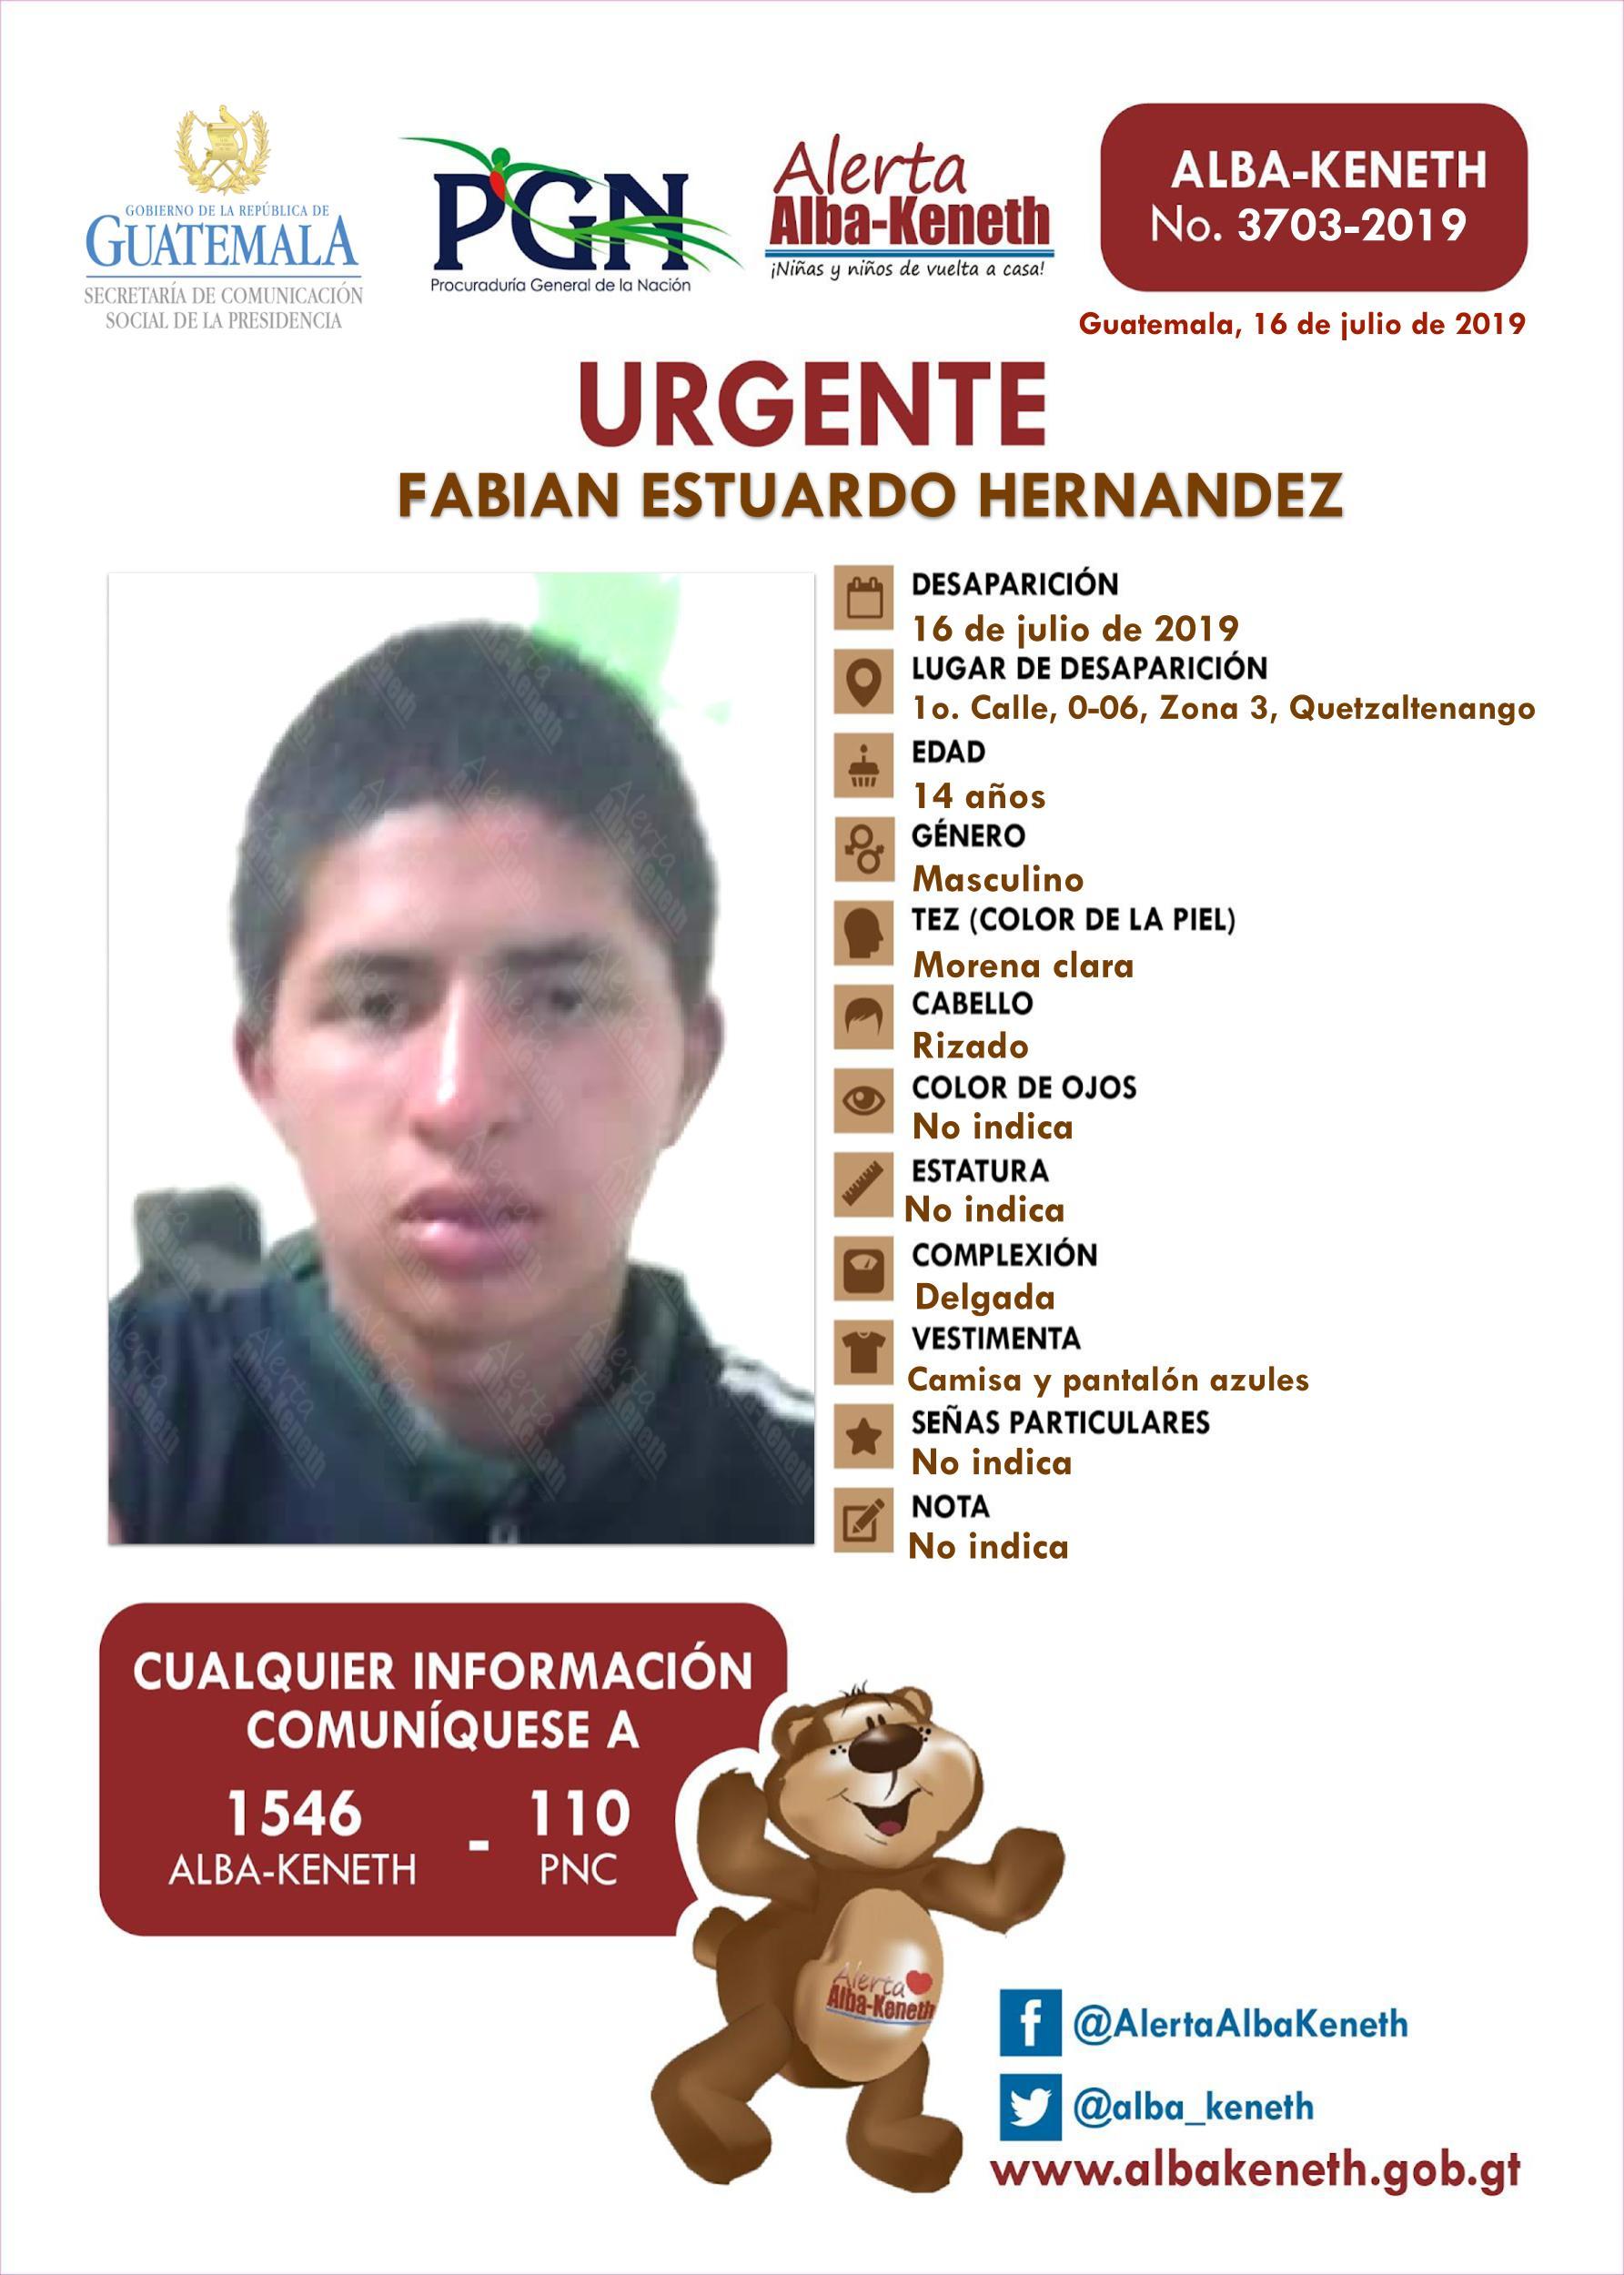 Fabian Estuardo Hernandez